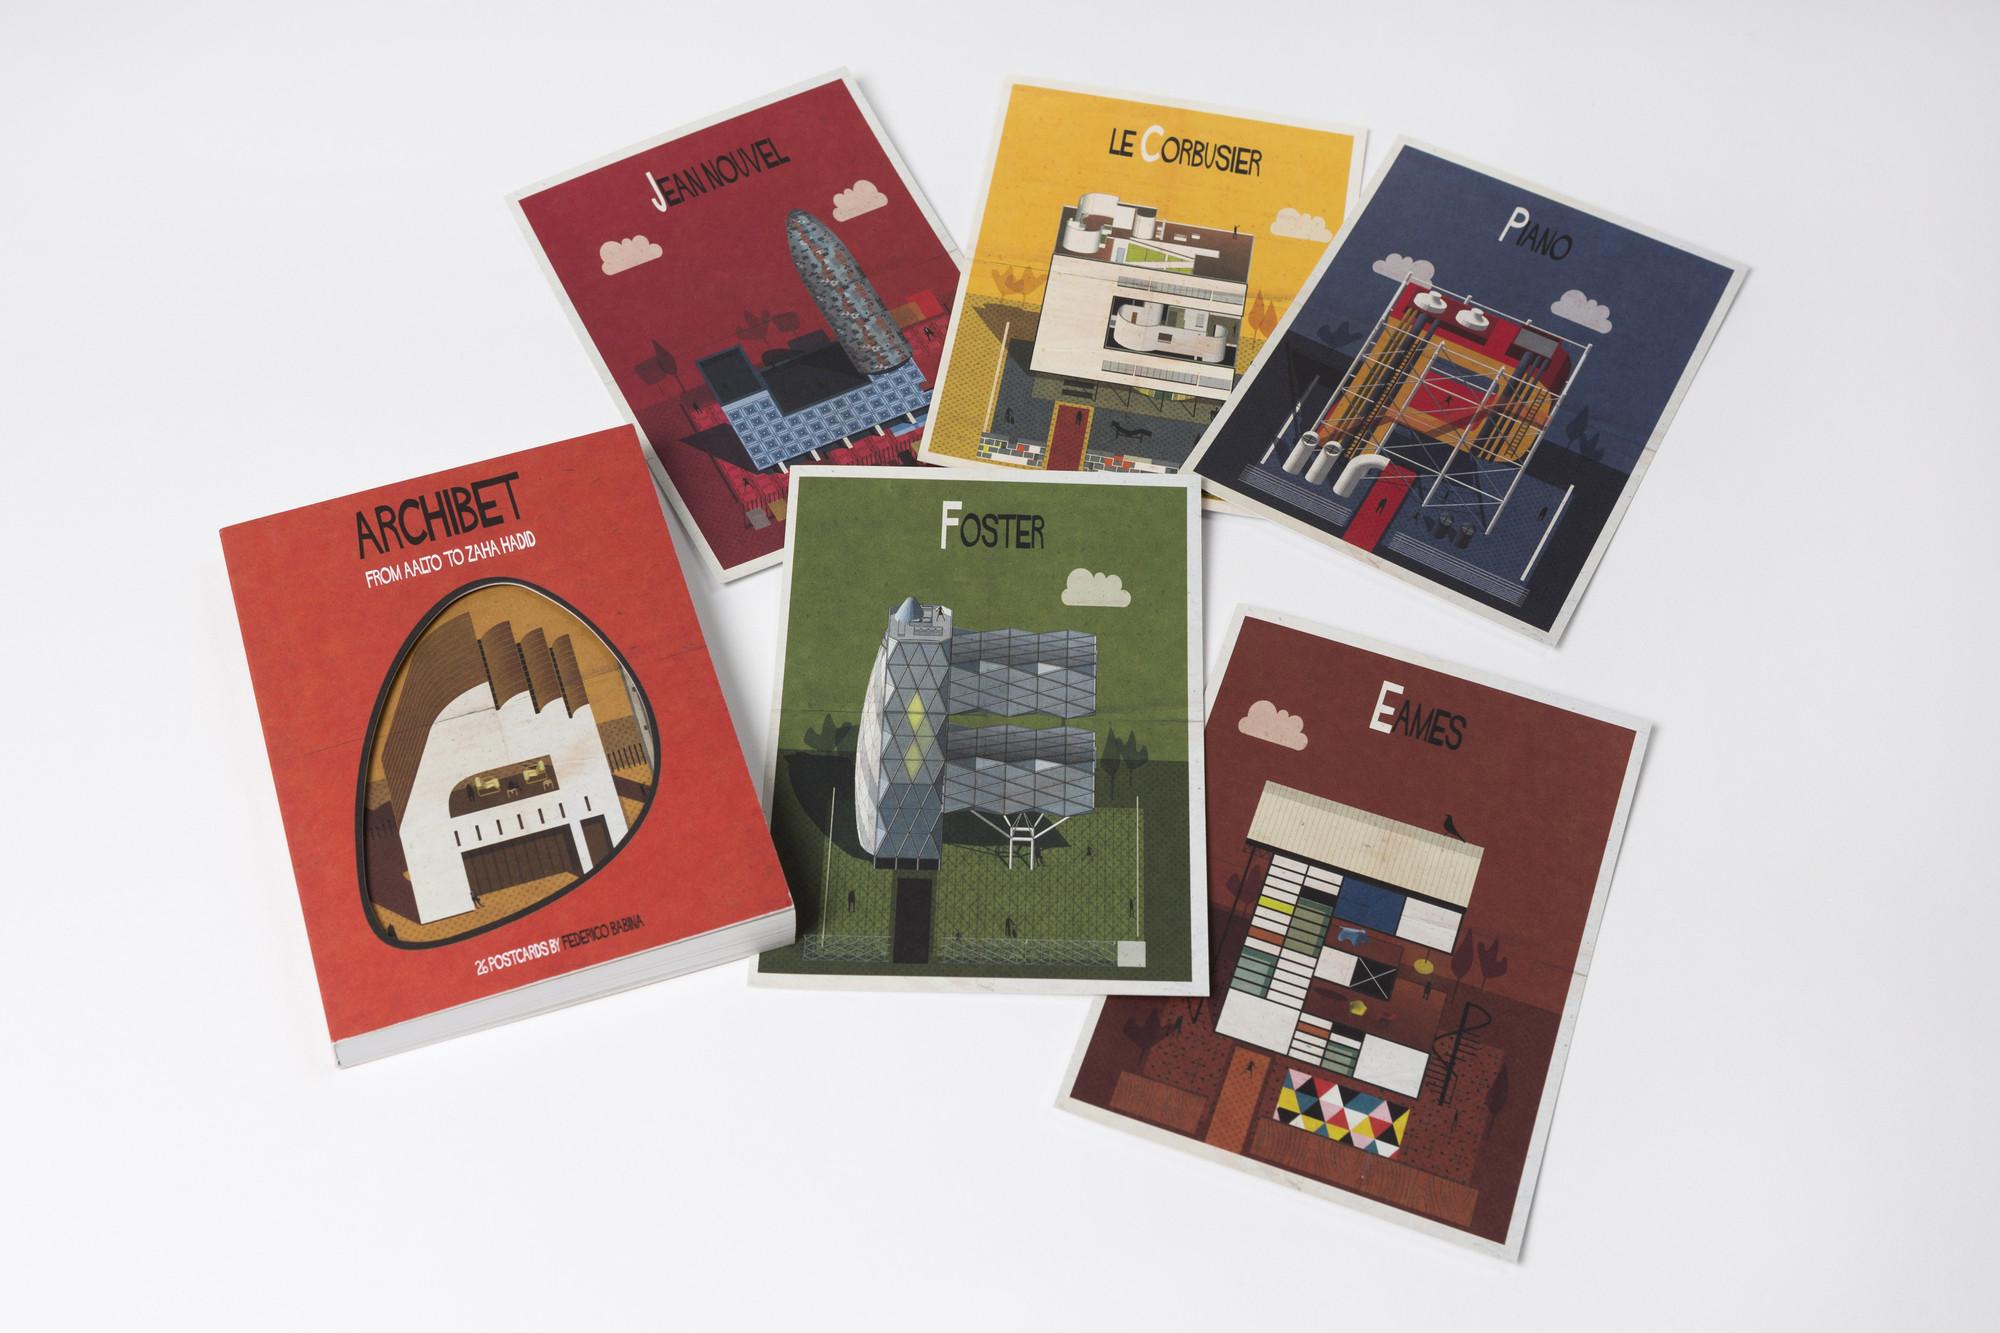 Win a Postcard Set of Federico Babina's Archibet, the Illustrated Alphabet of Architects, Archibet / Federico Babina. Image Courtesy of Laurence King